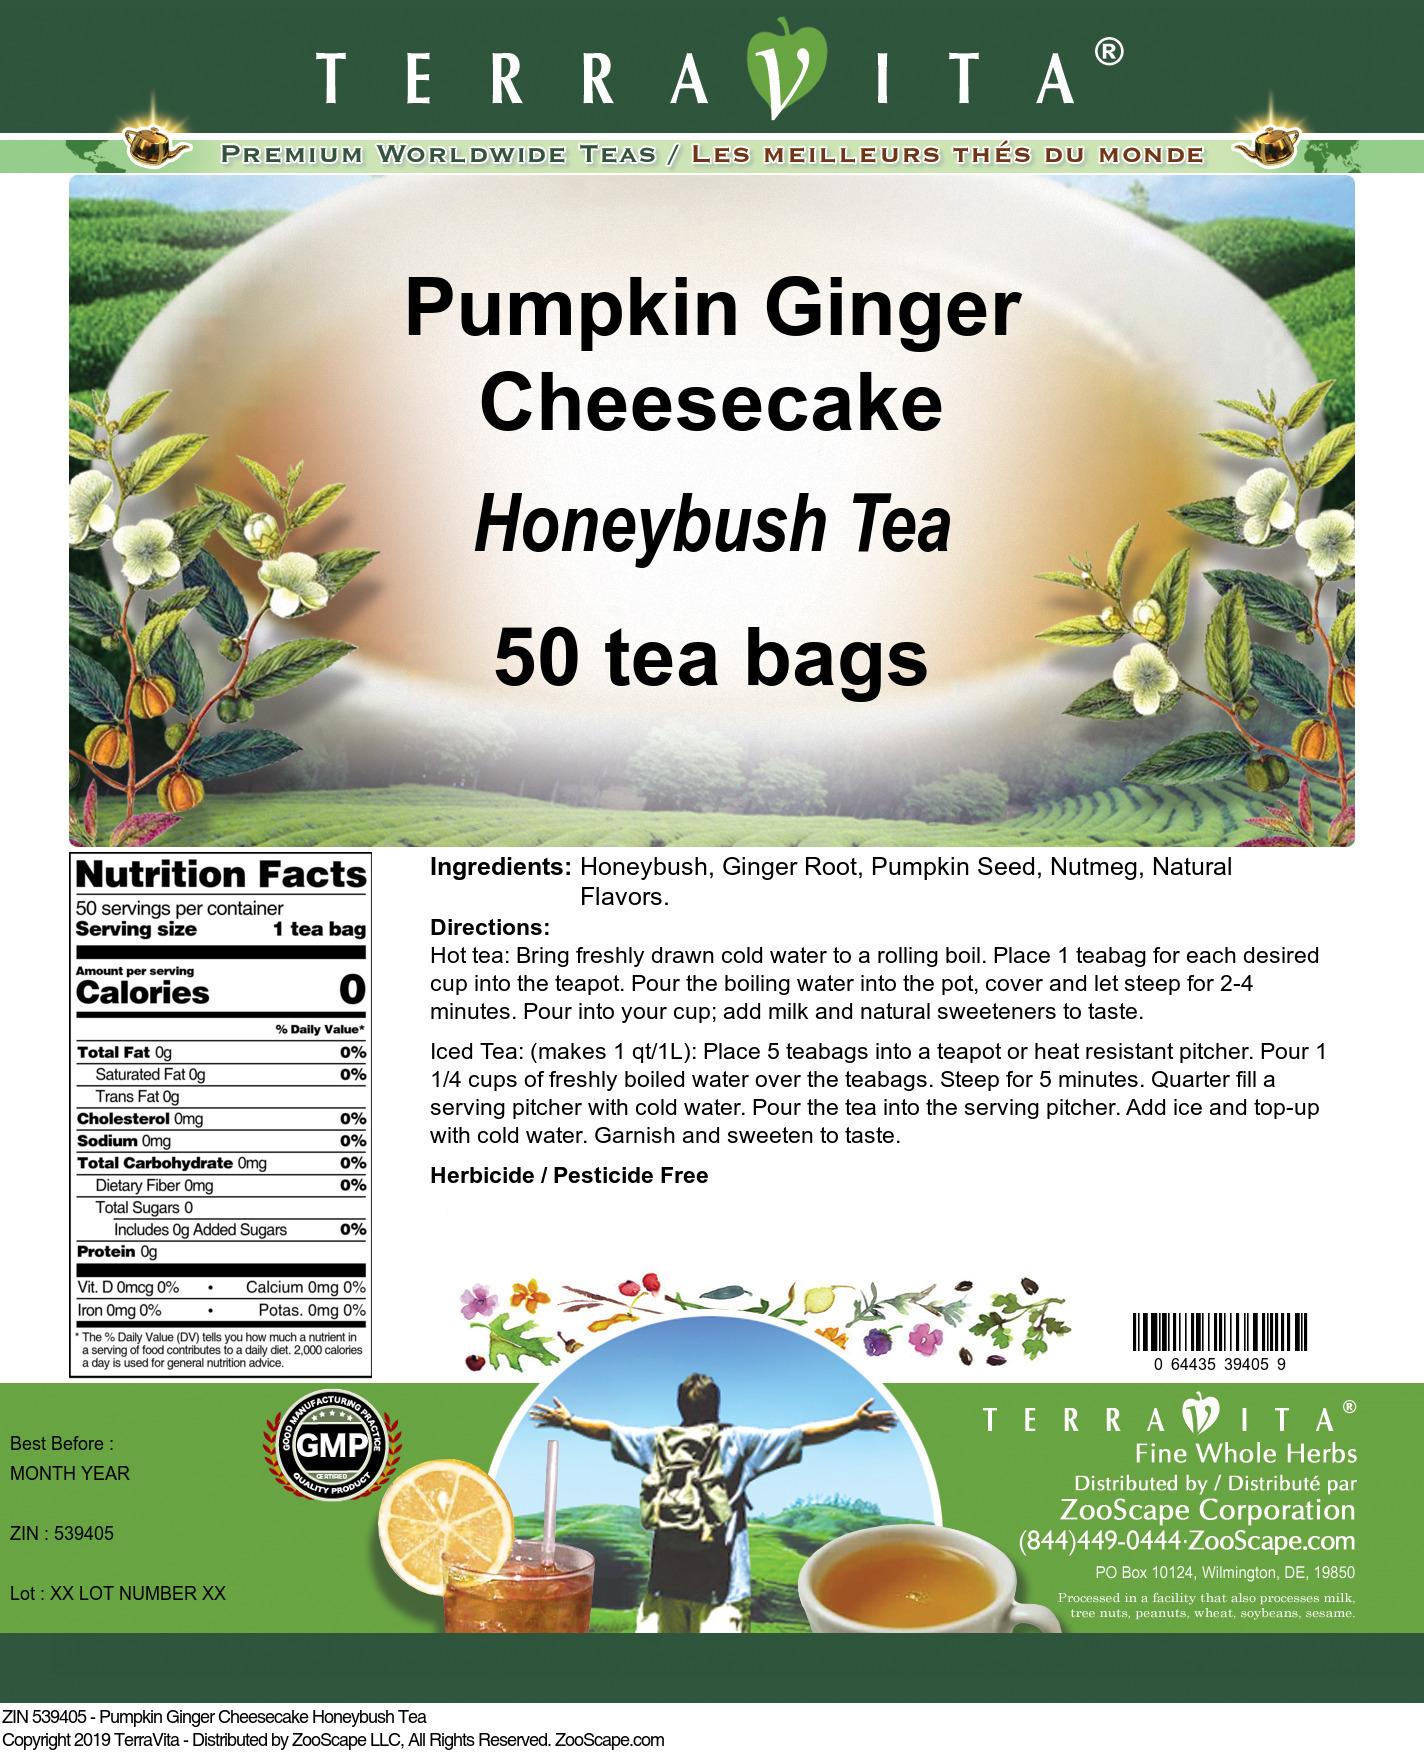 Pumpkin Ginger Cheesecake Honeybush Tea